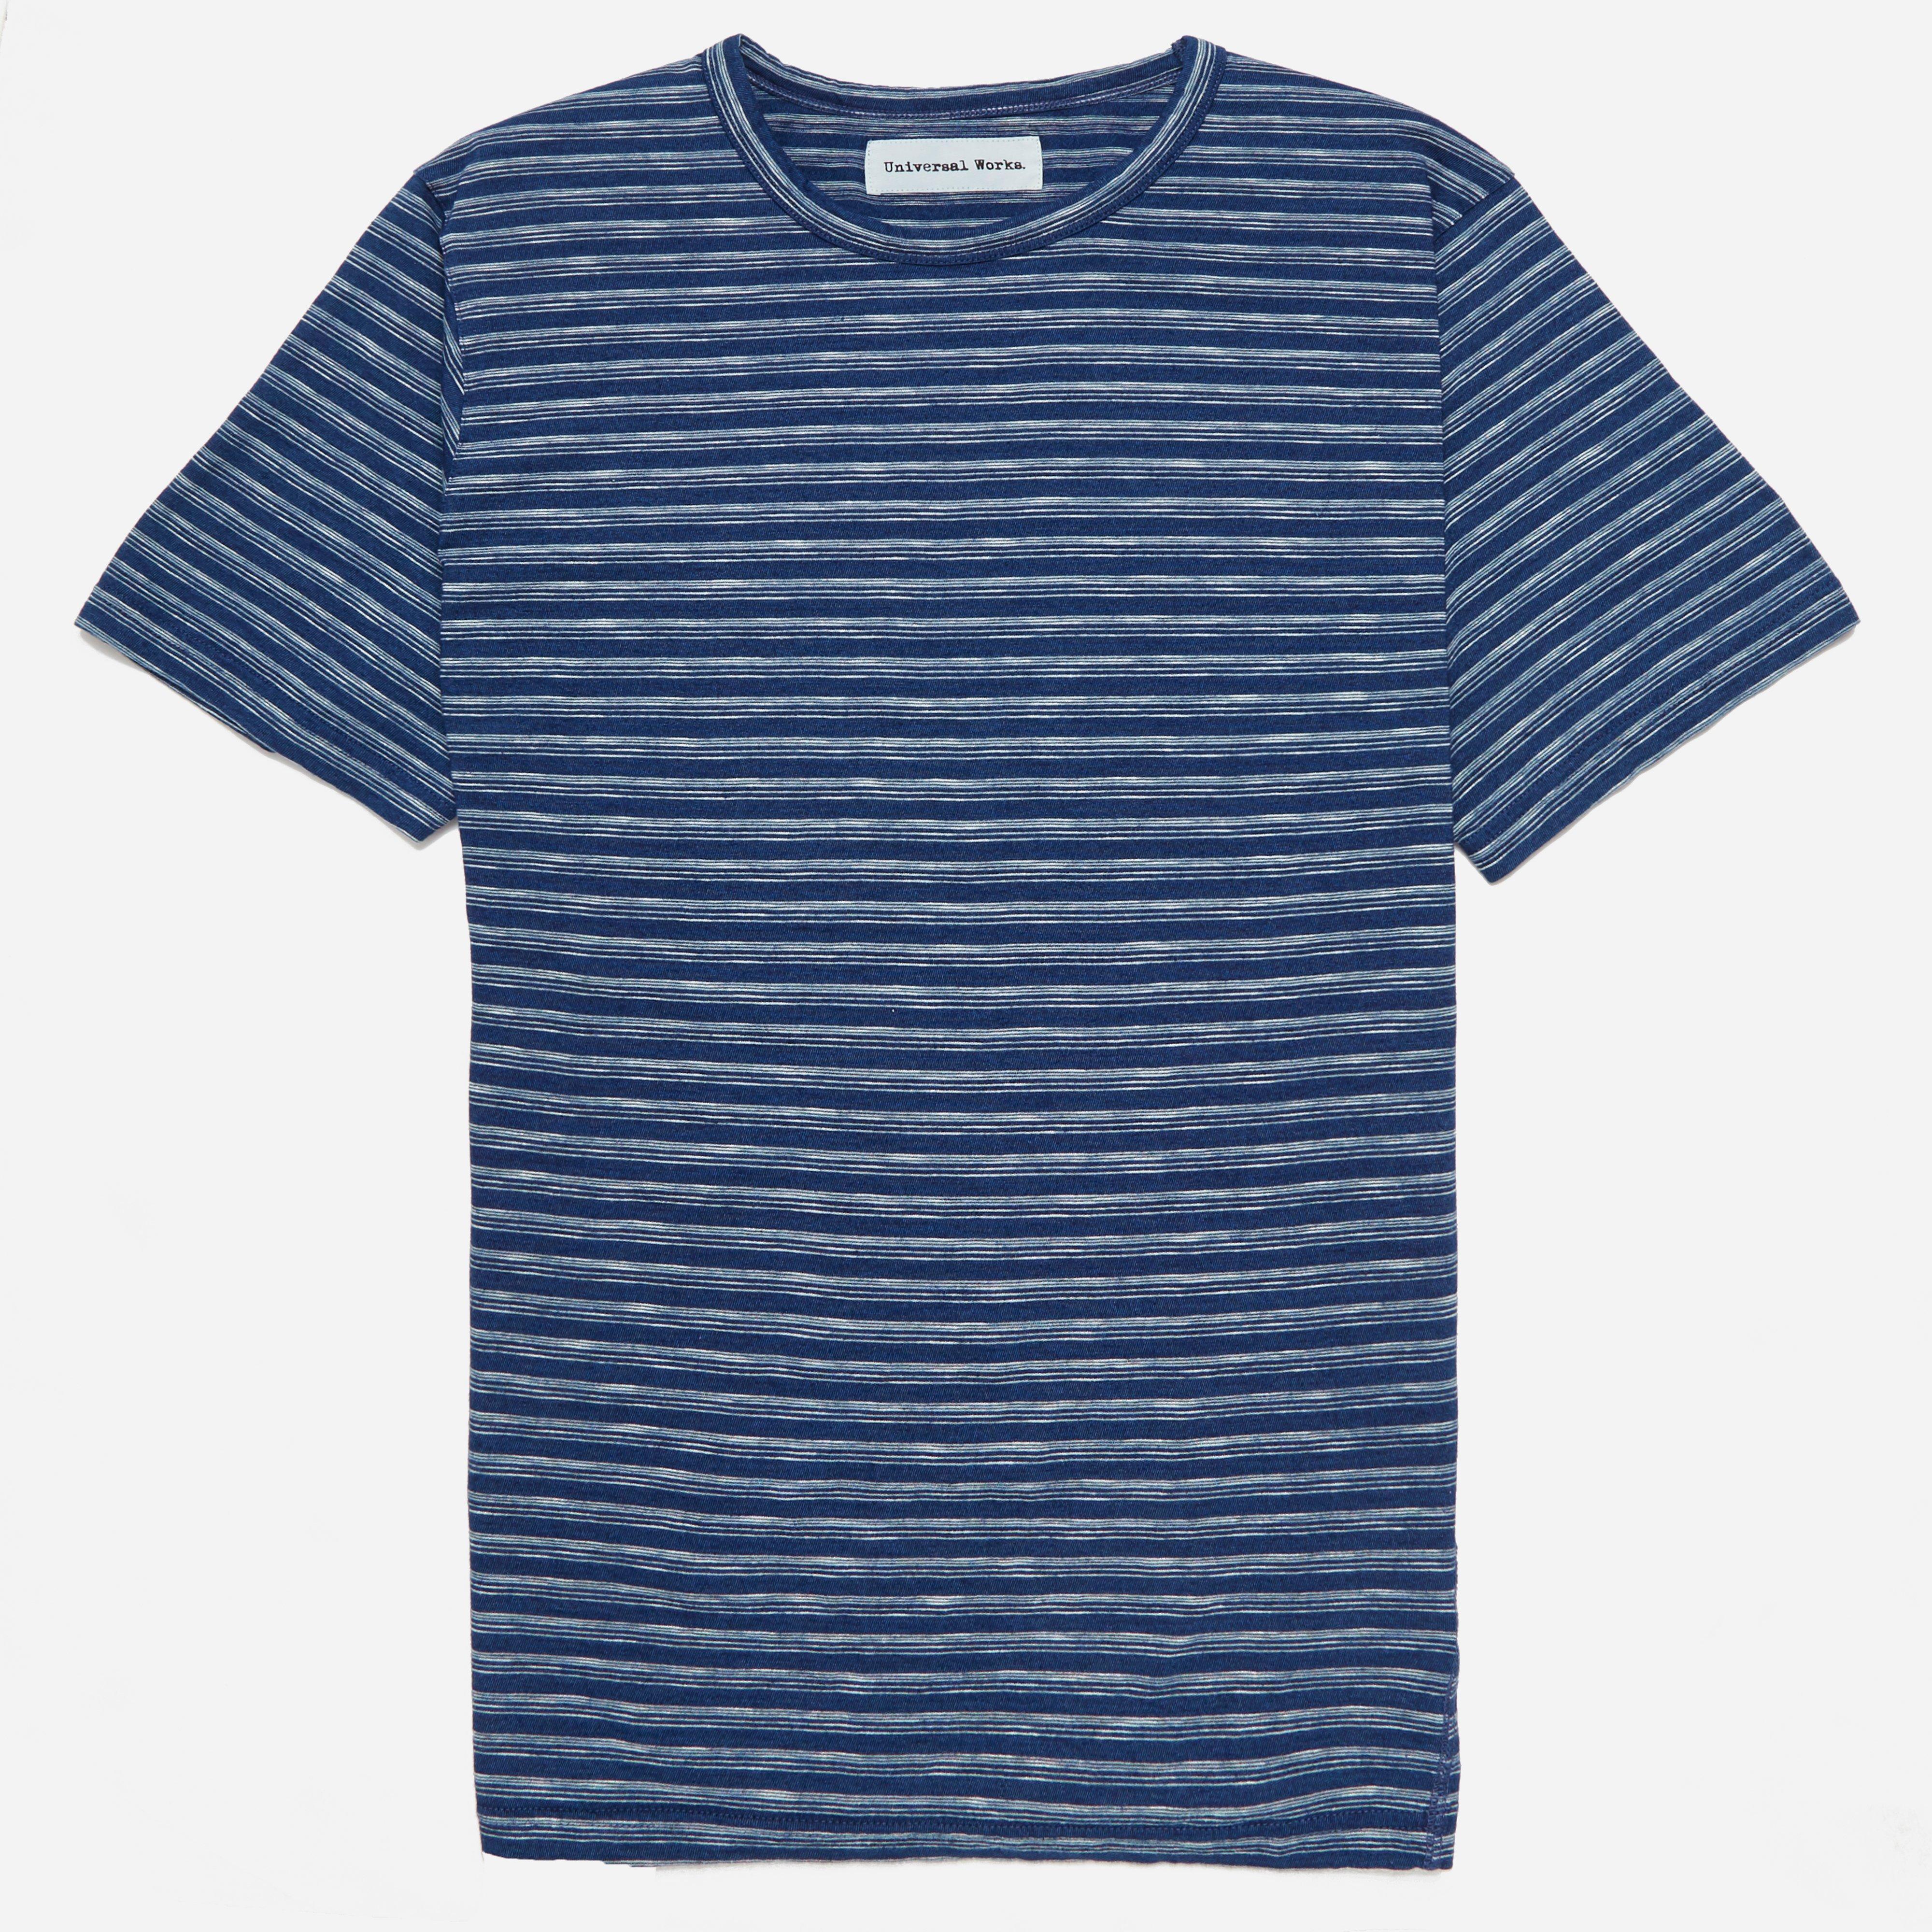 Universal Works Indigo Stripe T-shirt